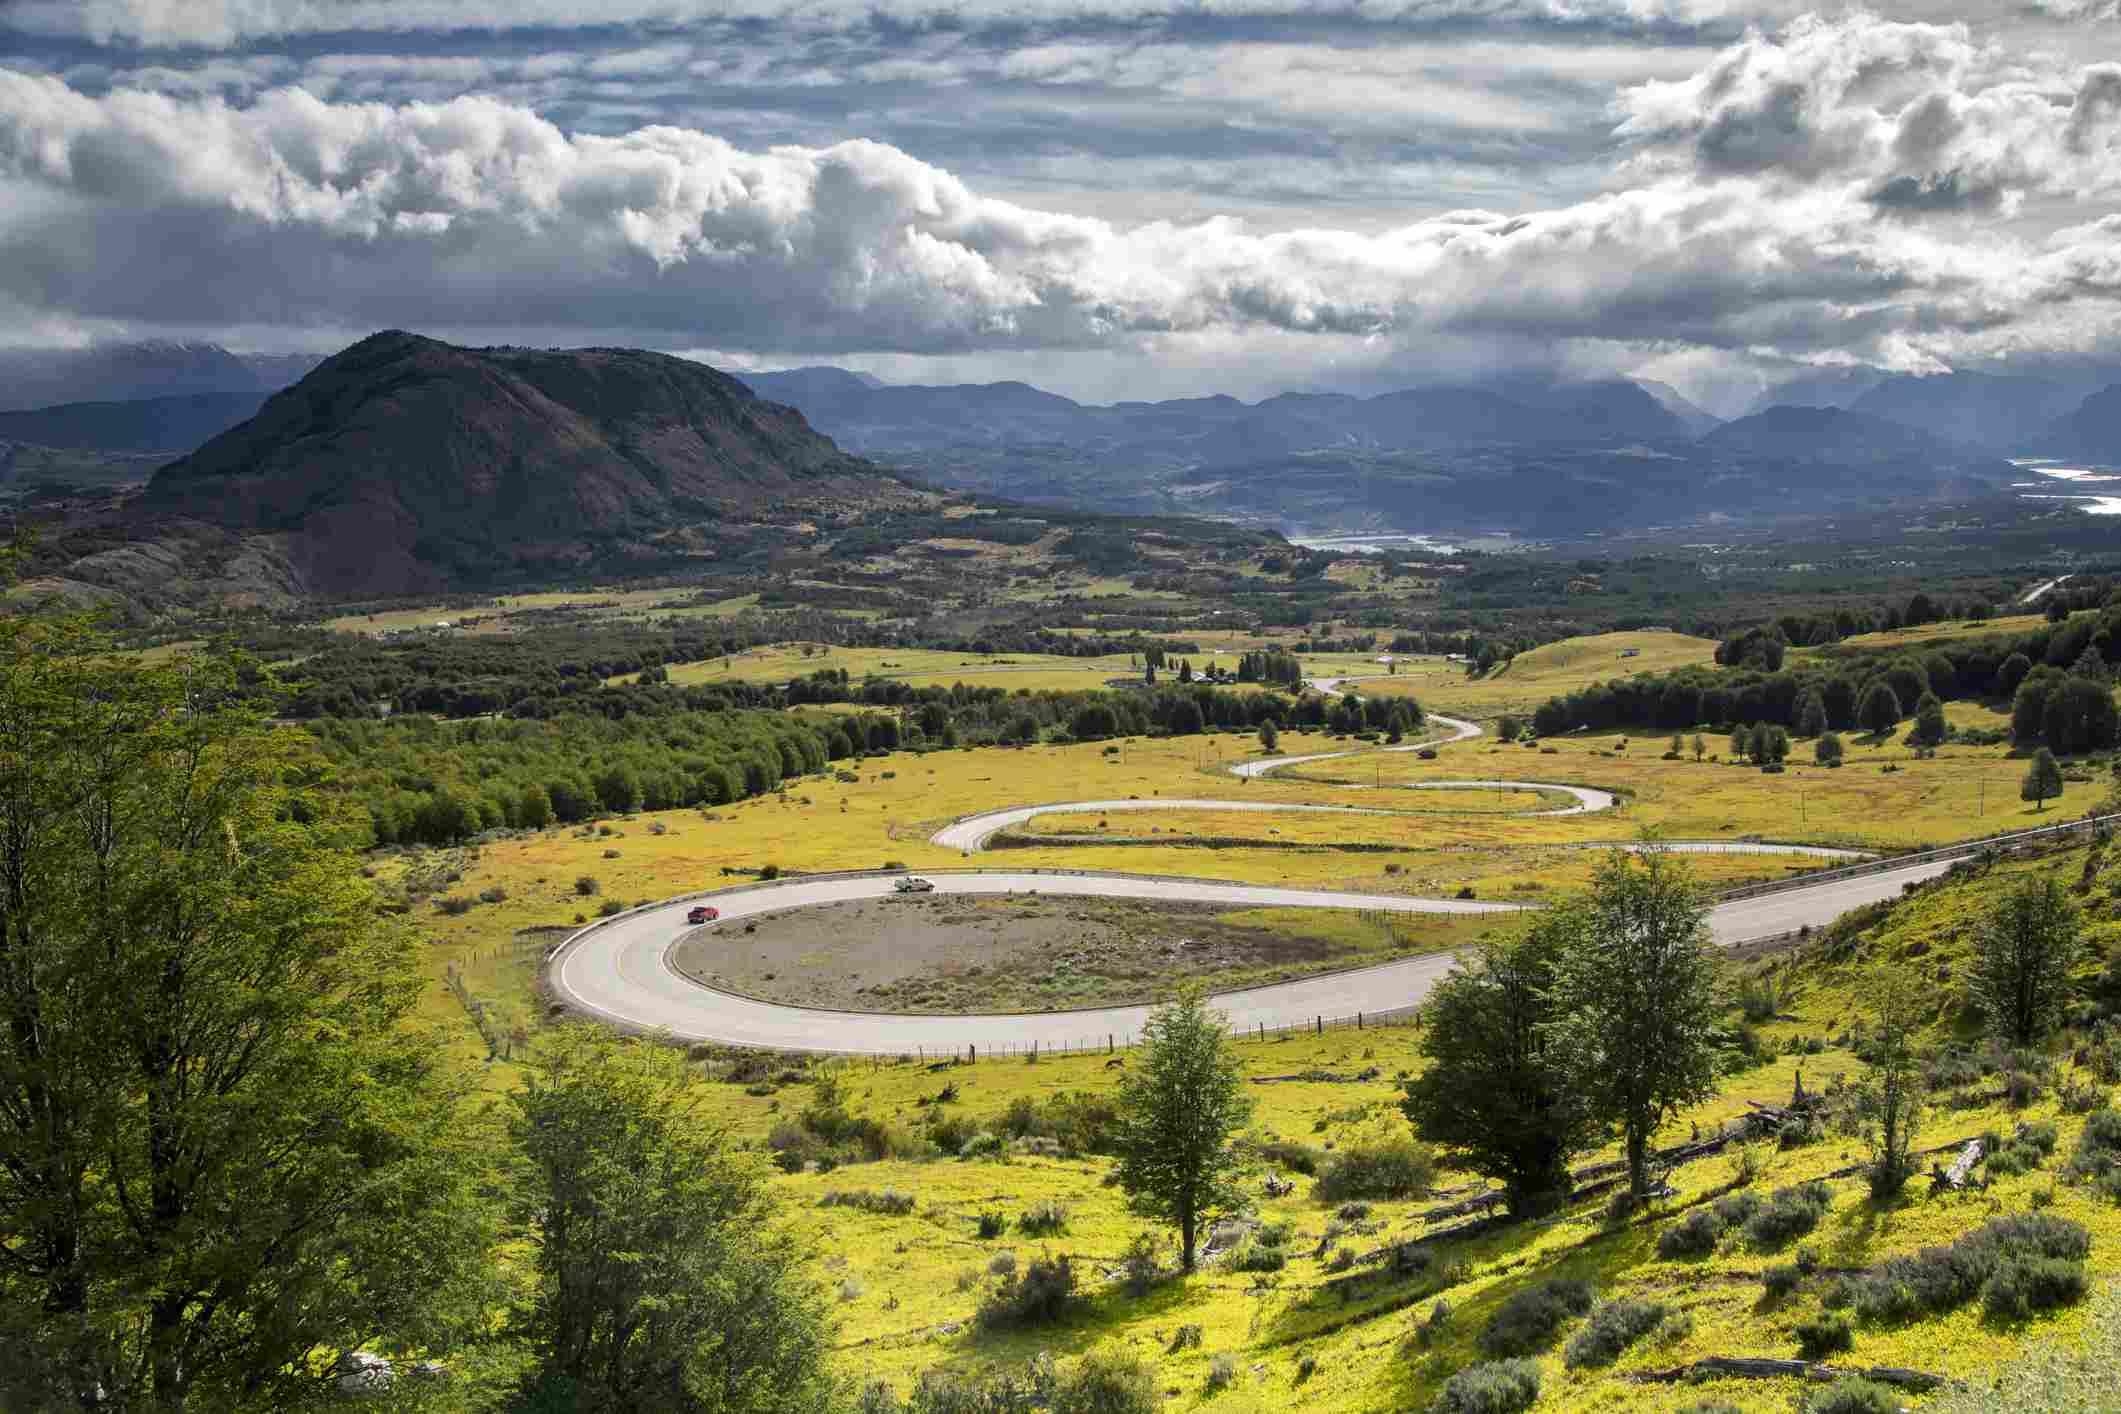 Carretera Austral Road en Chile